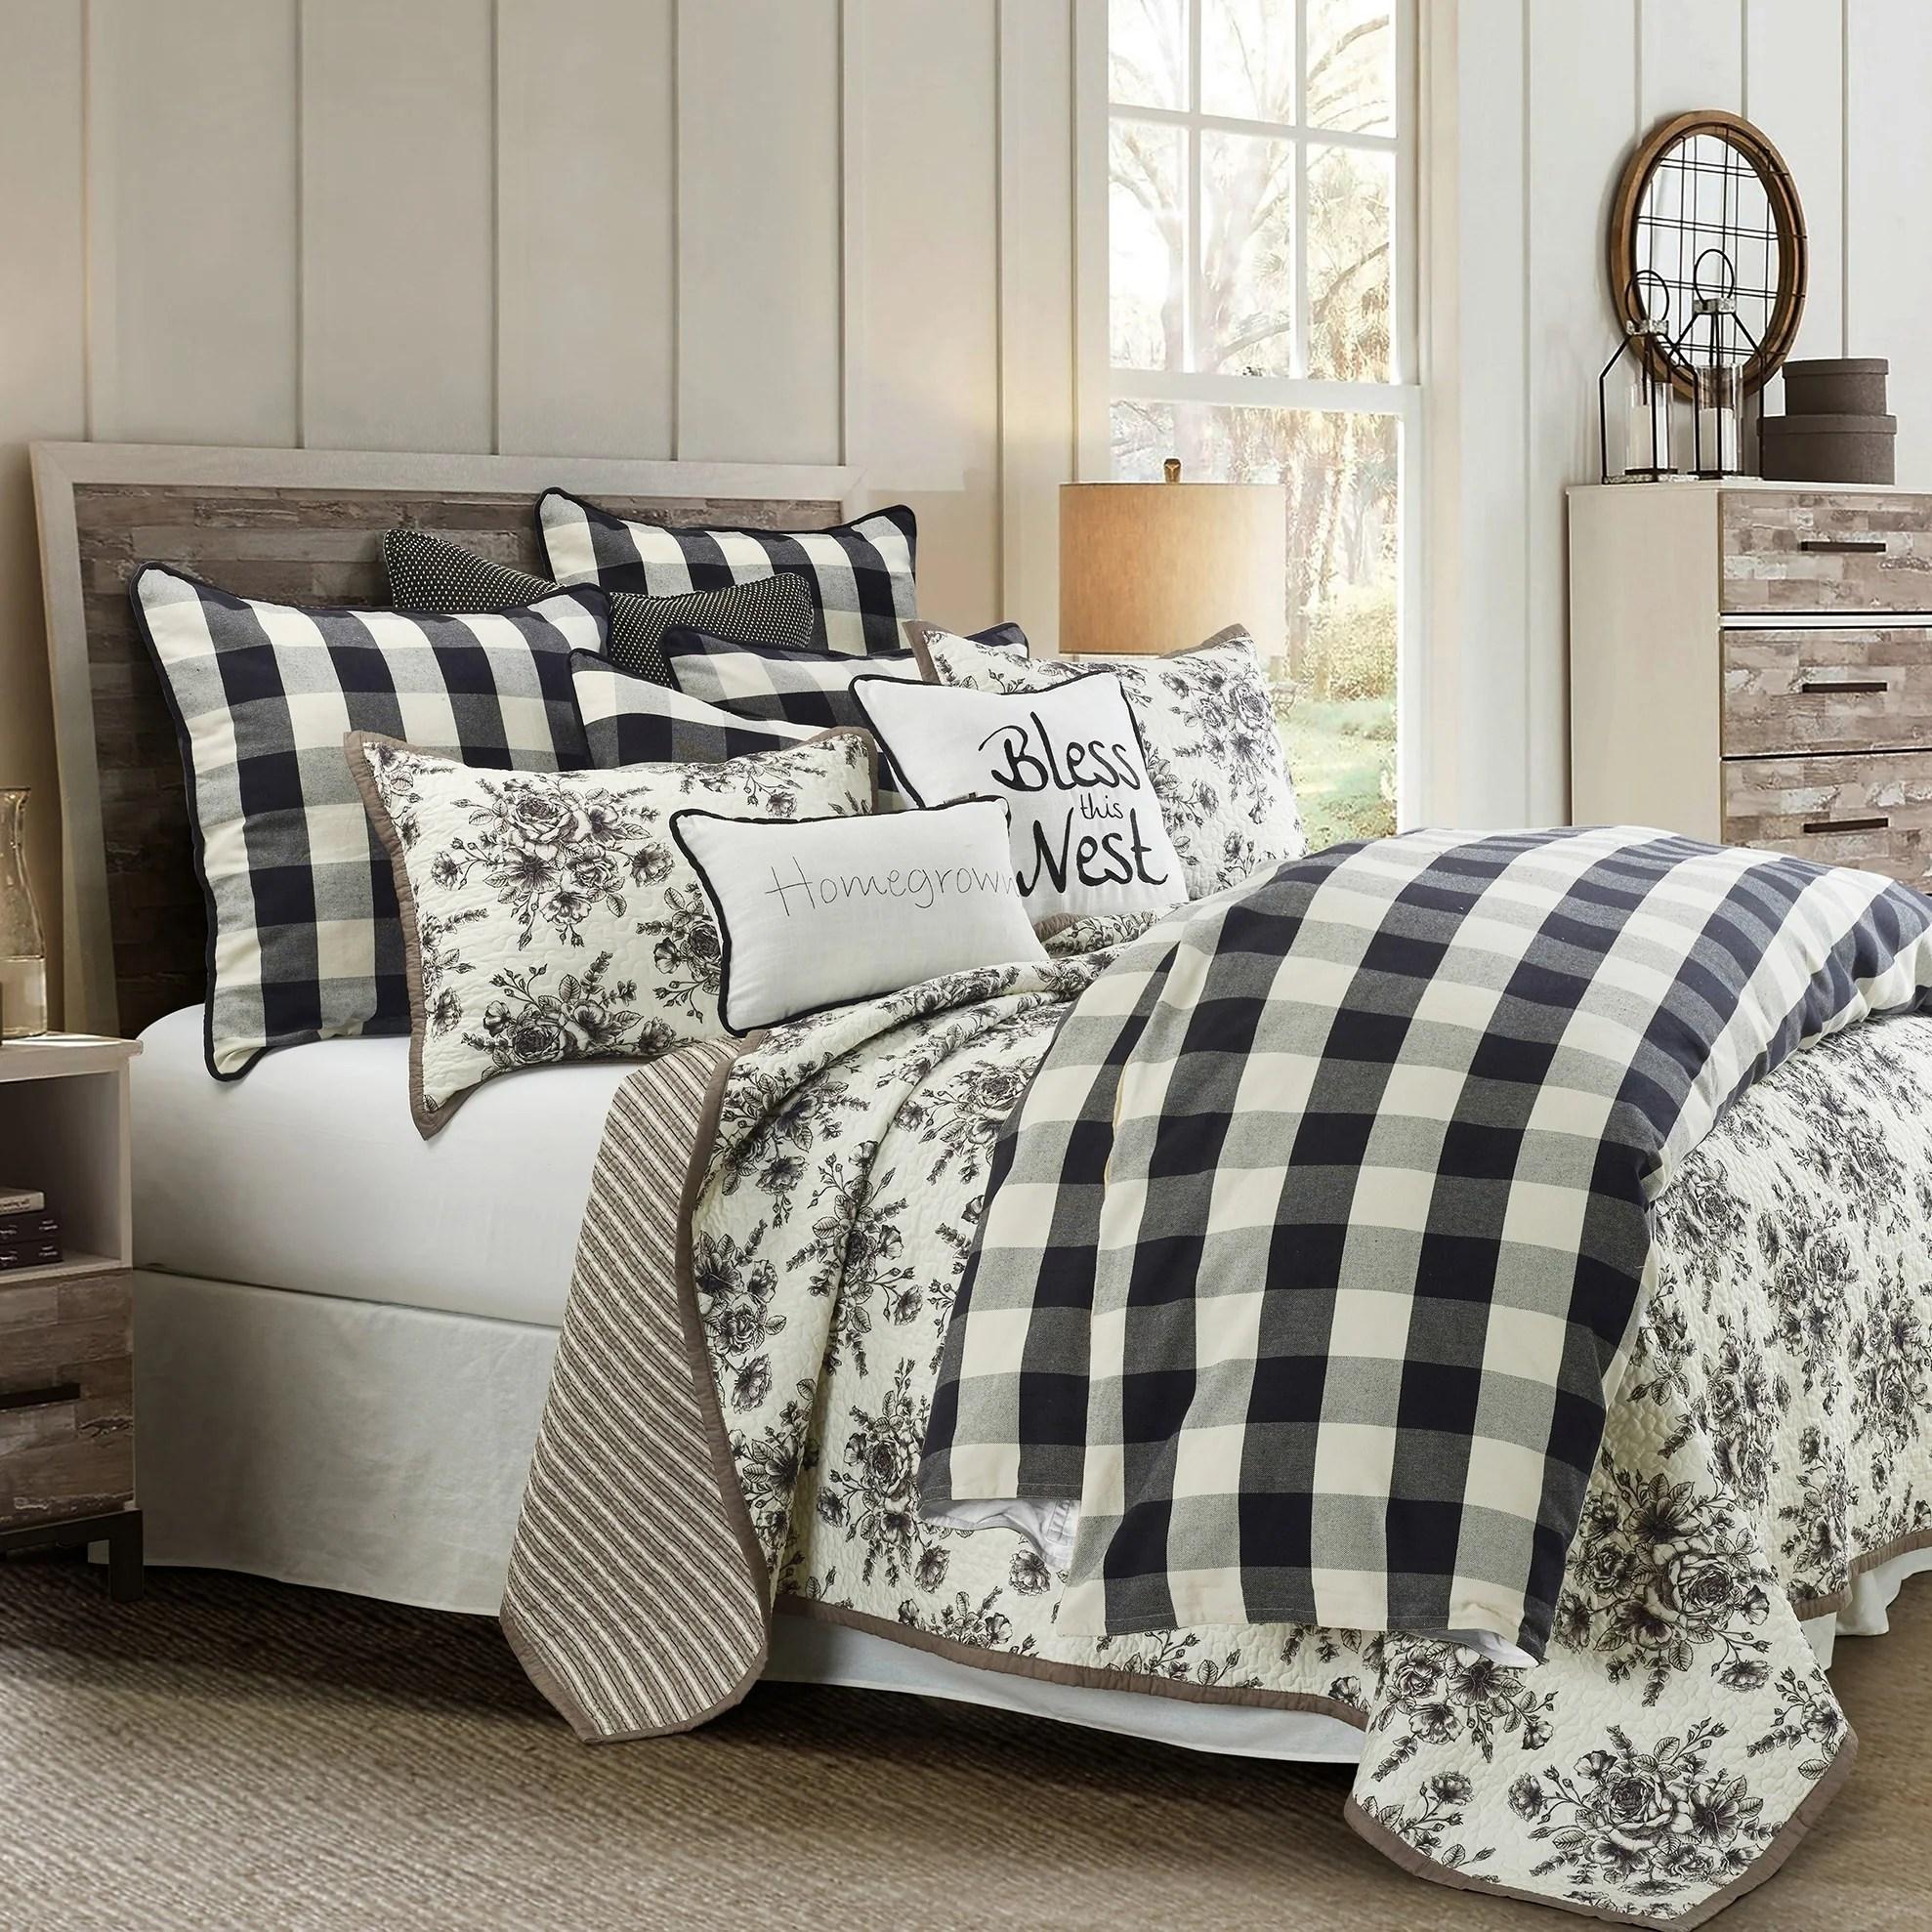 hiend accents camille comforter set super king black white 3pc